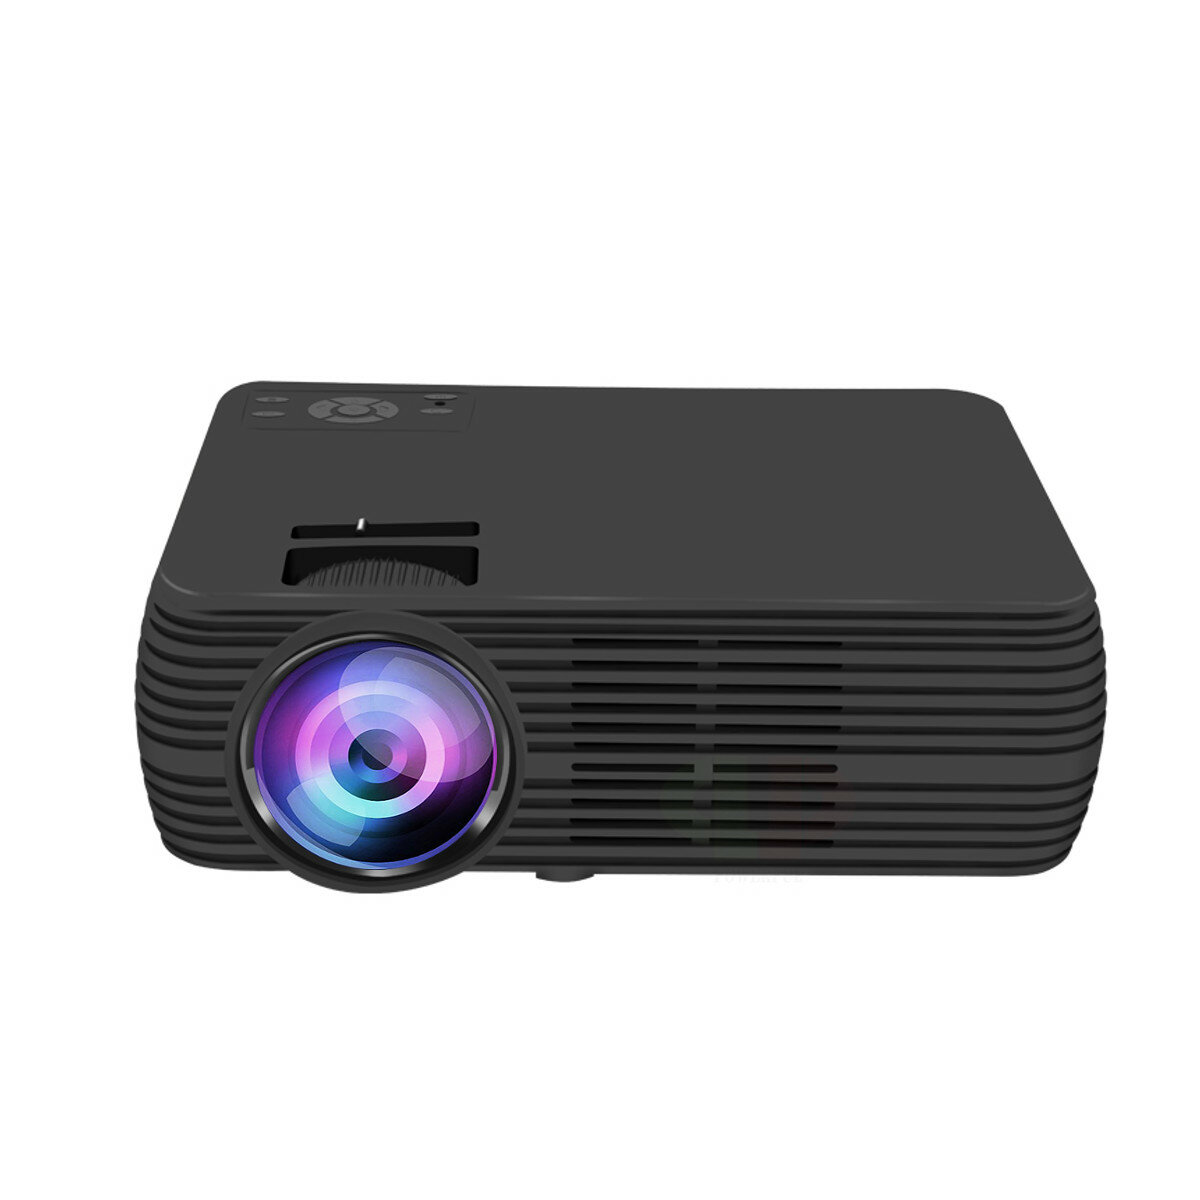 X5 LCD Projector 7000 Lumens 1920x1080 1080p HD Multimedia Home Cinema Smart Home Theater LED Projector HDMI VGA AV SD USB